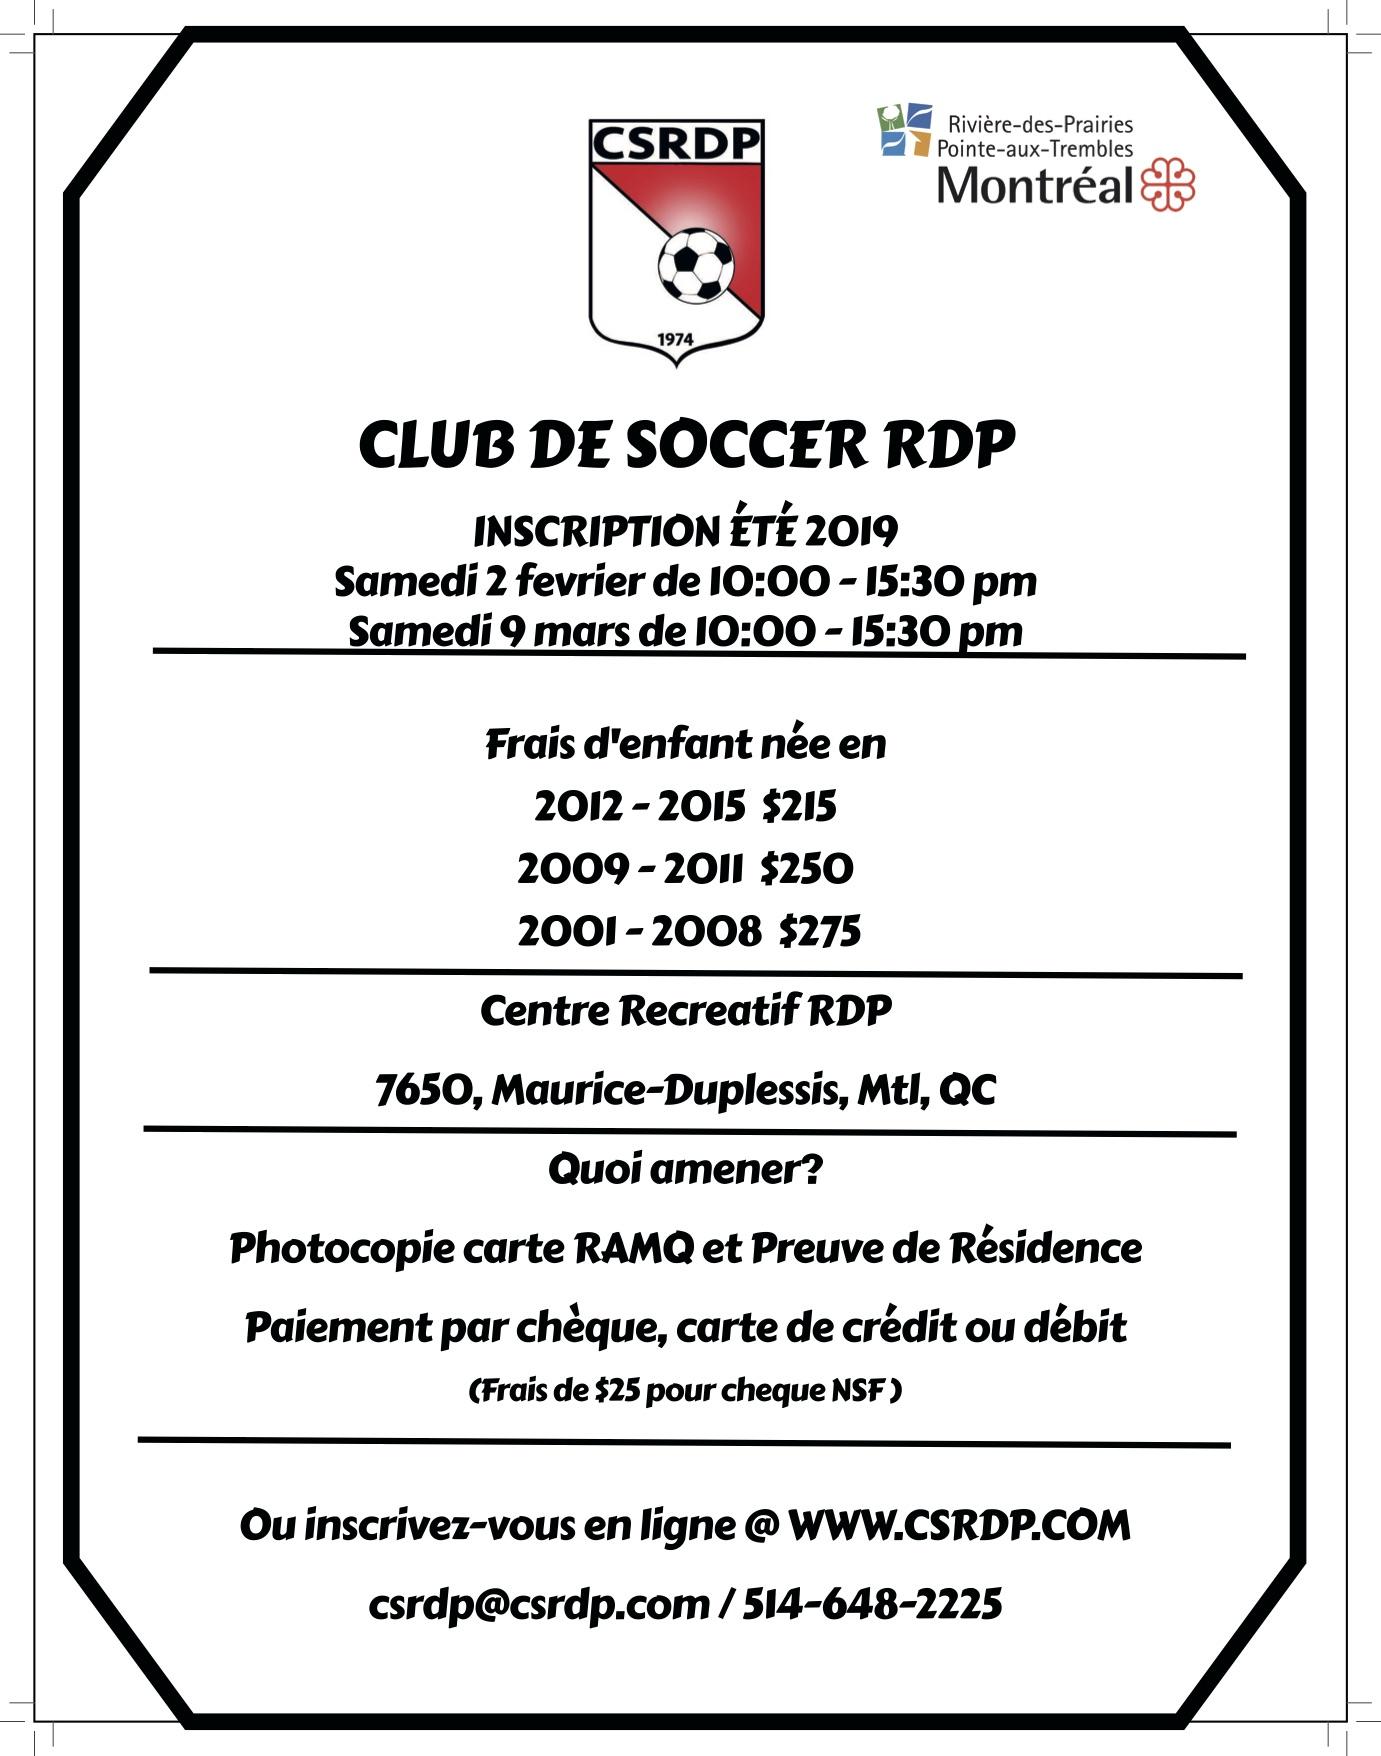 CSRDP soccer inscription 2019 copy.jpg